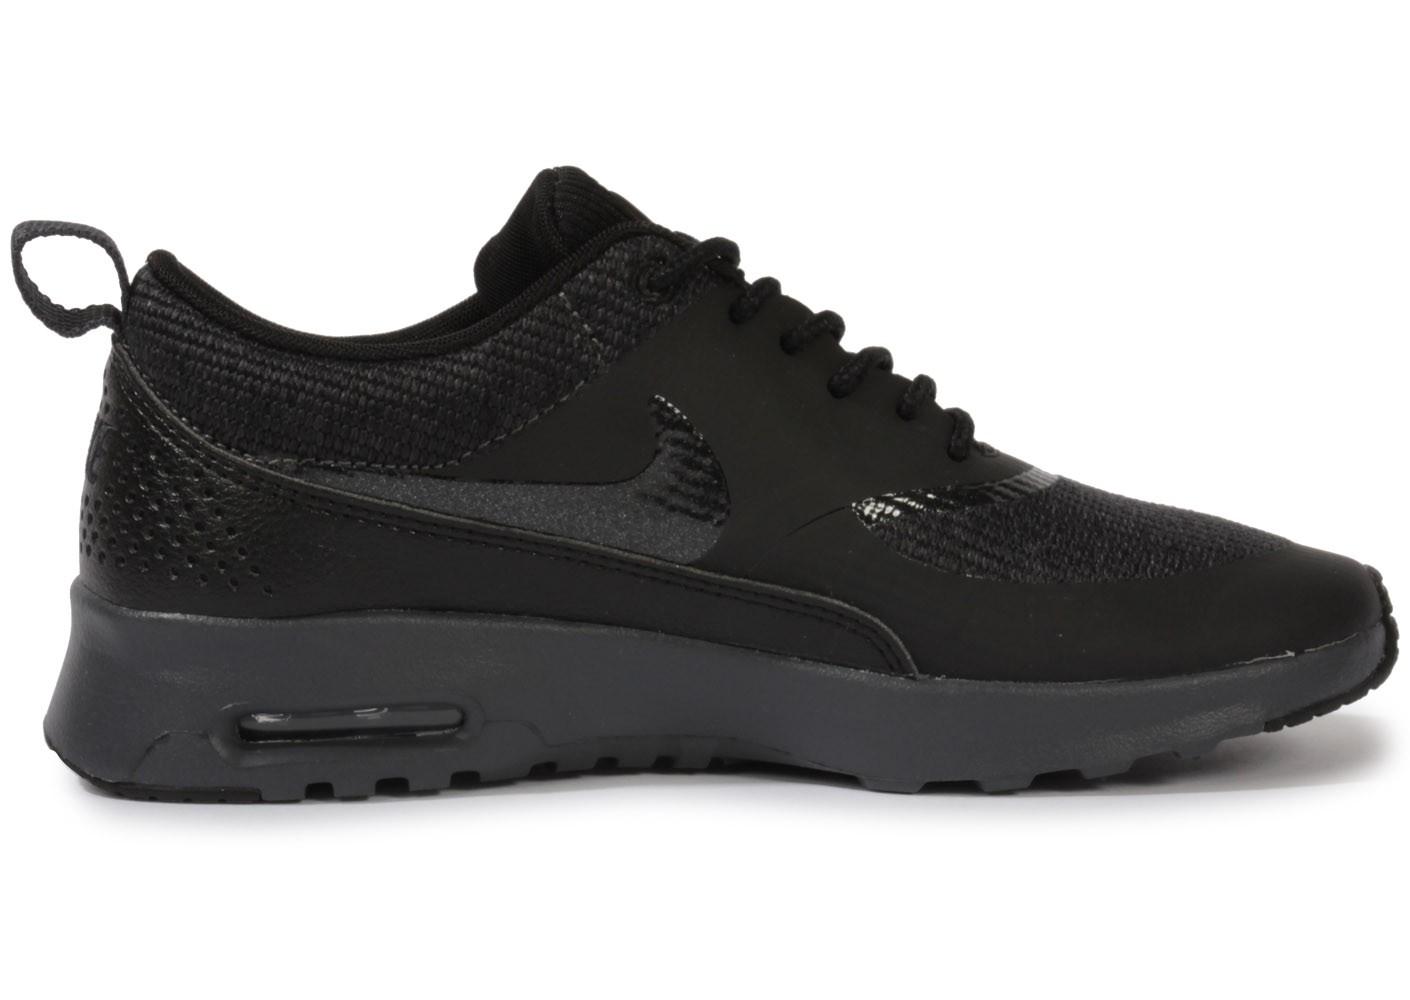 tout neuf c3a9f beb74 chaussure air max thea homme